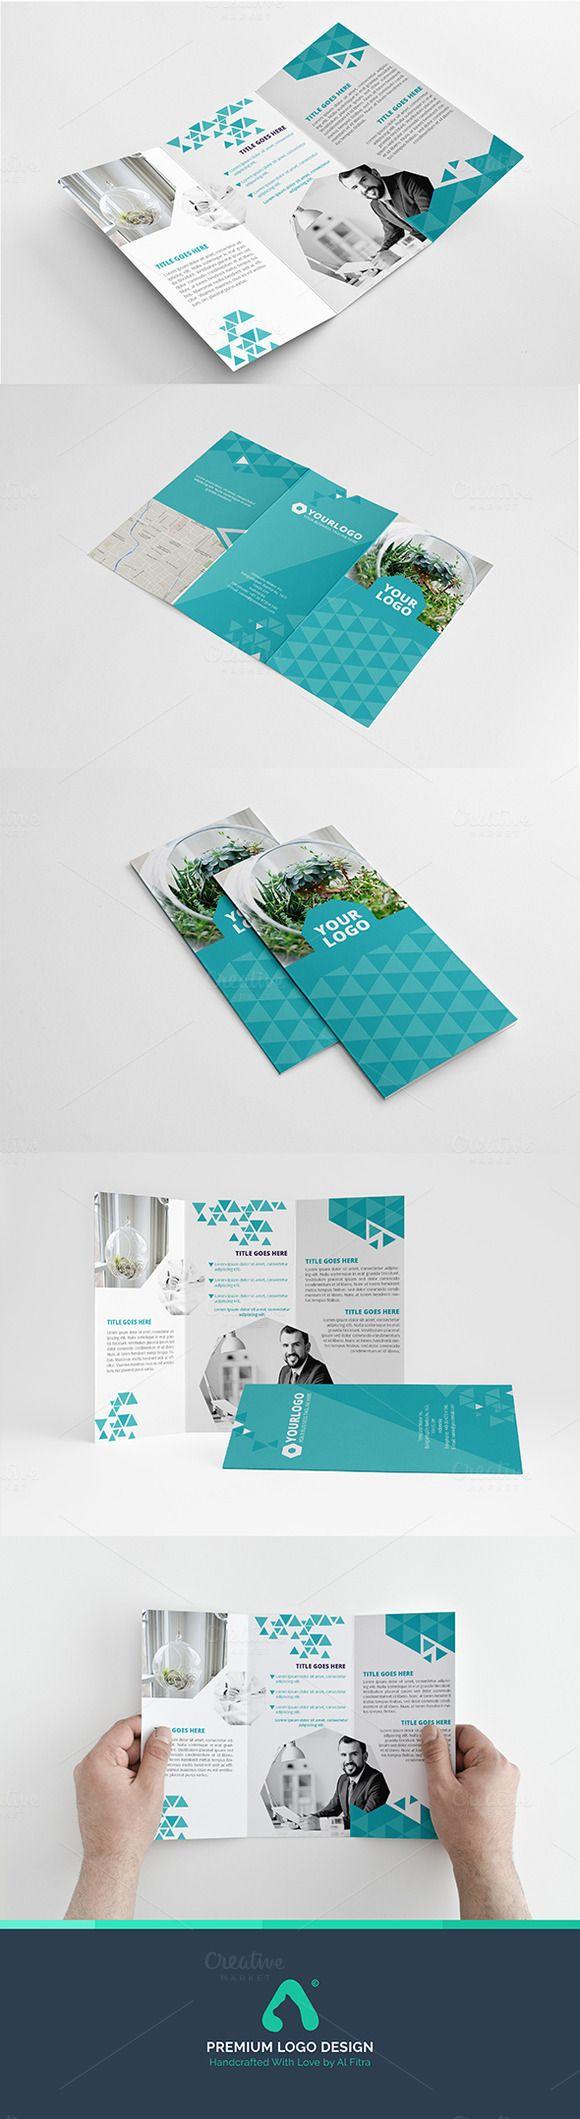 Toska Trifold Template   Pinterest   Tríptico, Folletos y Diseño ...